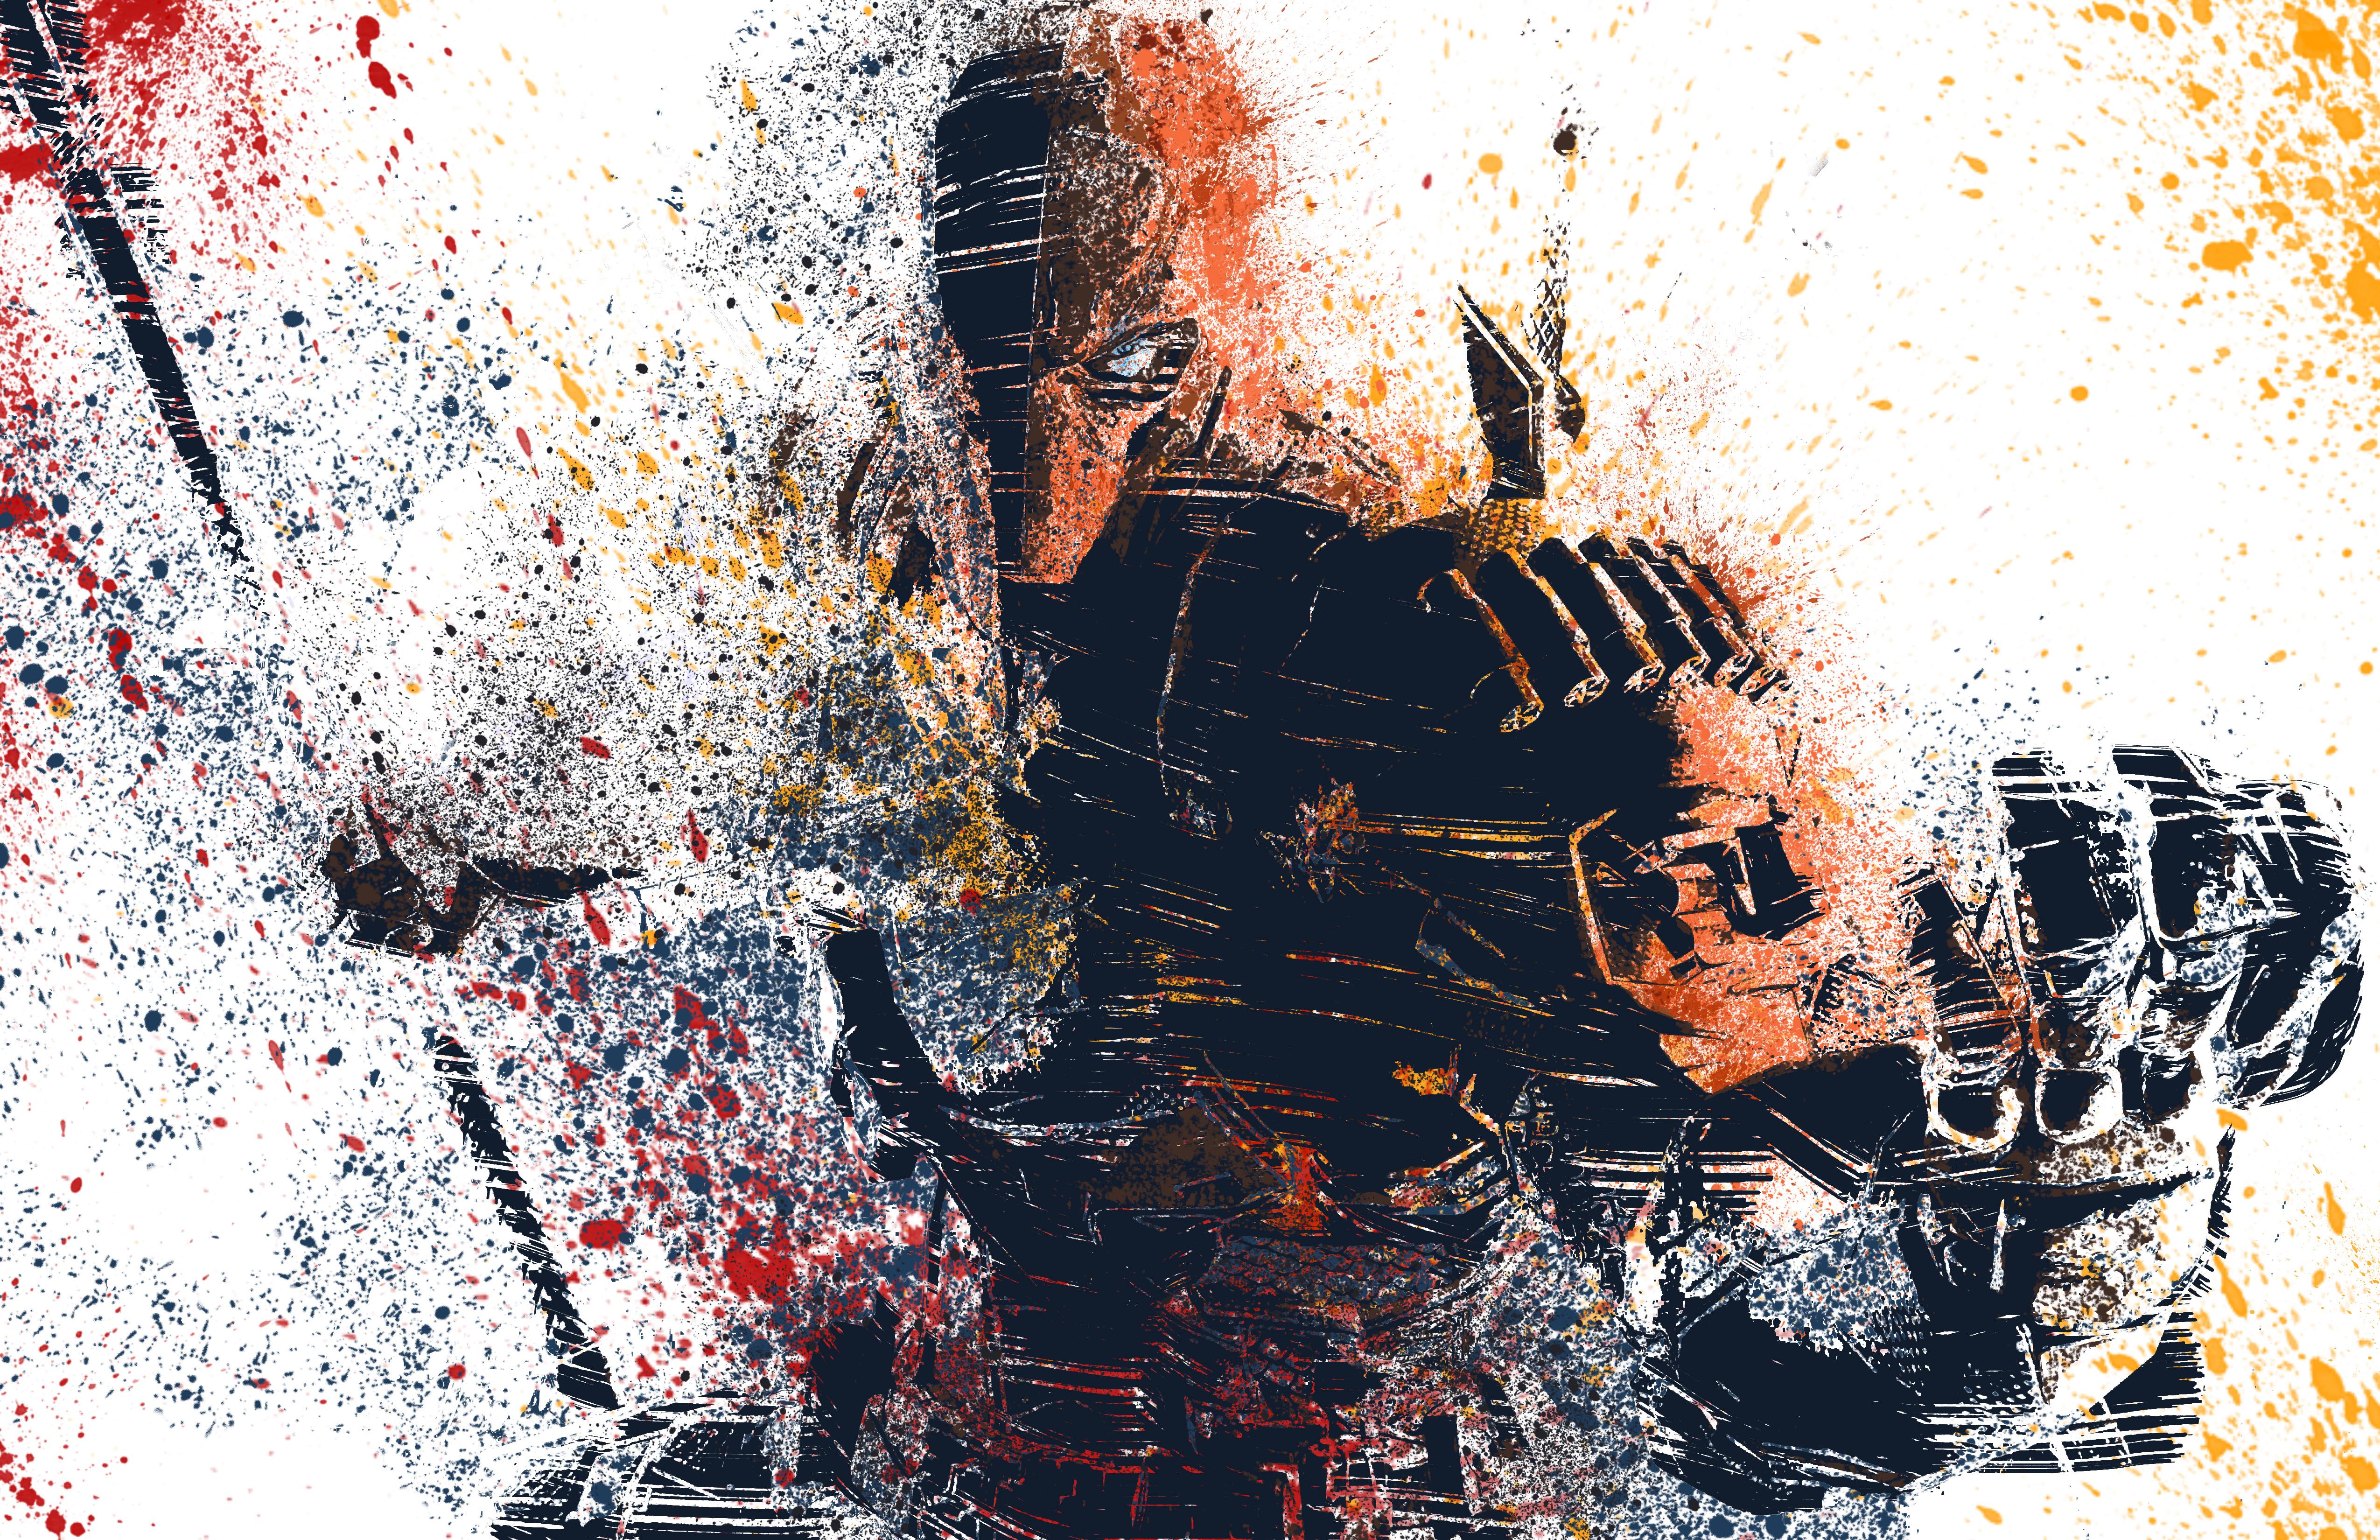 2560x1080 Final Fantasy Xv Artwork 2560x1080 Resolution Hd: 2560x1080 Deathstroke Splat Colours Artwork 2560x1080